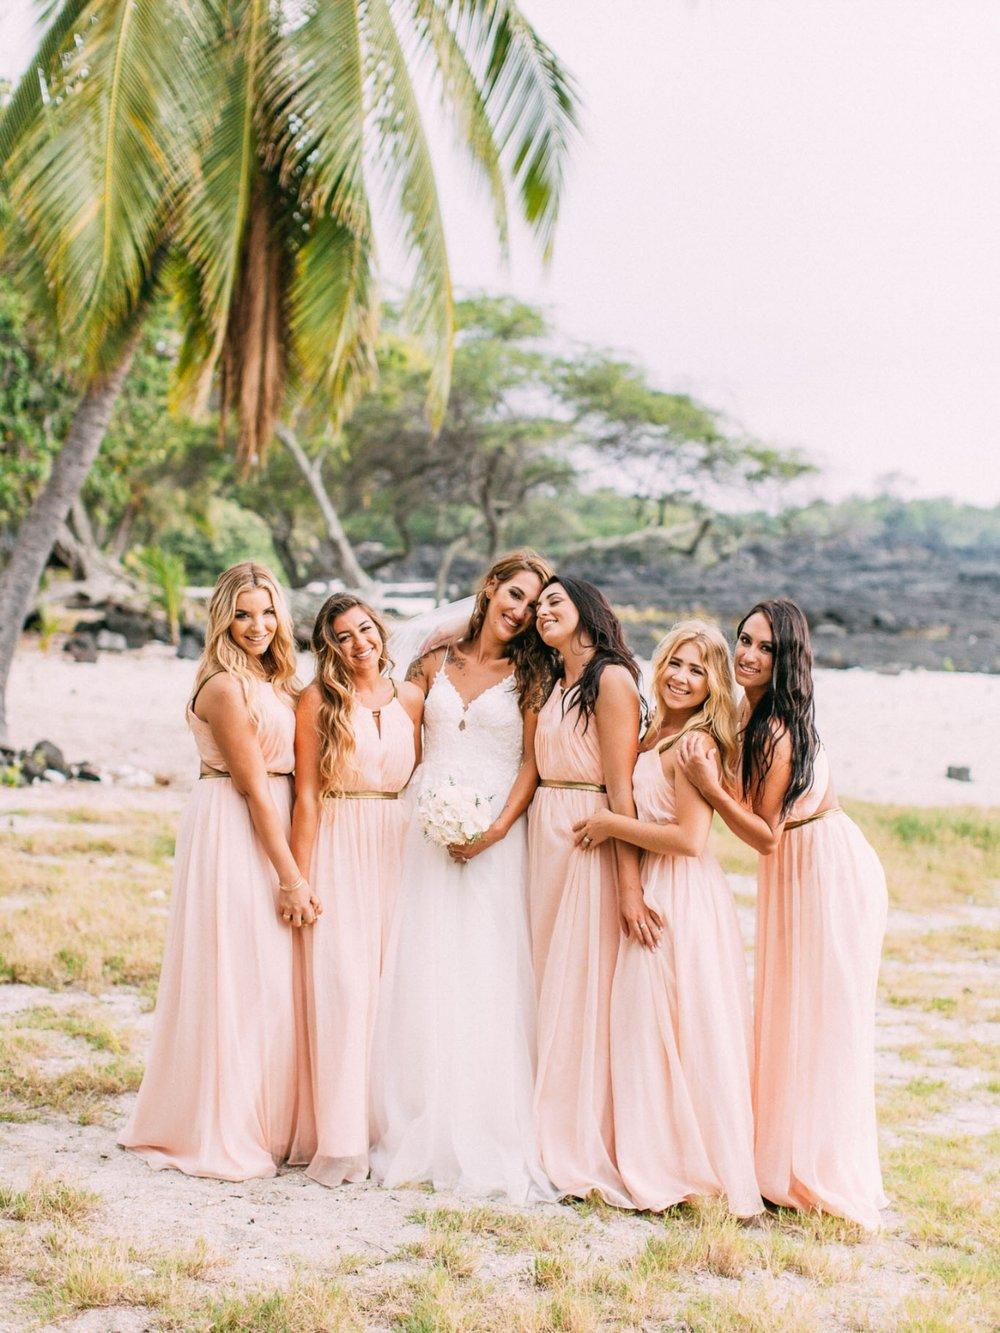 Hawaii-Wedding-Photographer-Kona-Rhianna-Mercier-Jessica-Preston-2016-WEB-664 (1).jpg